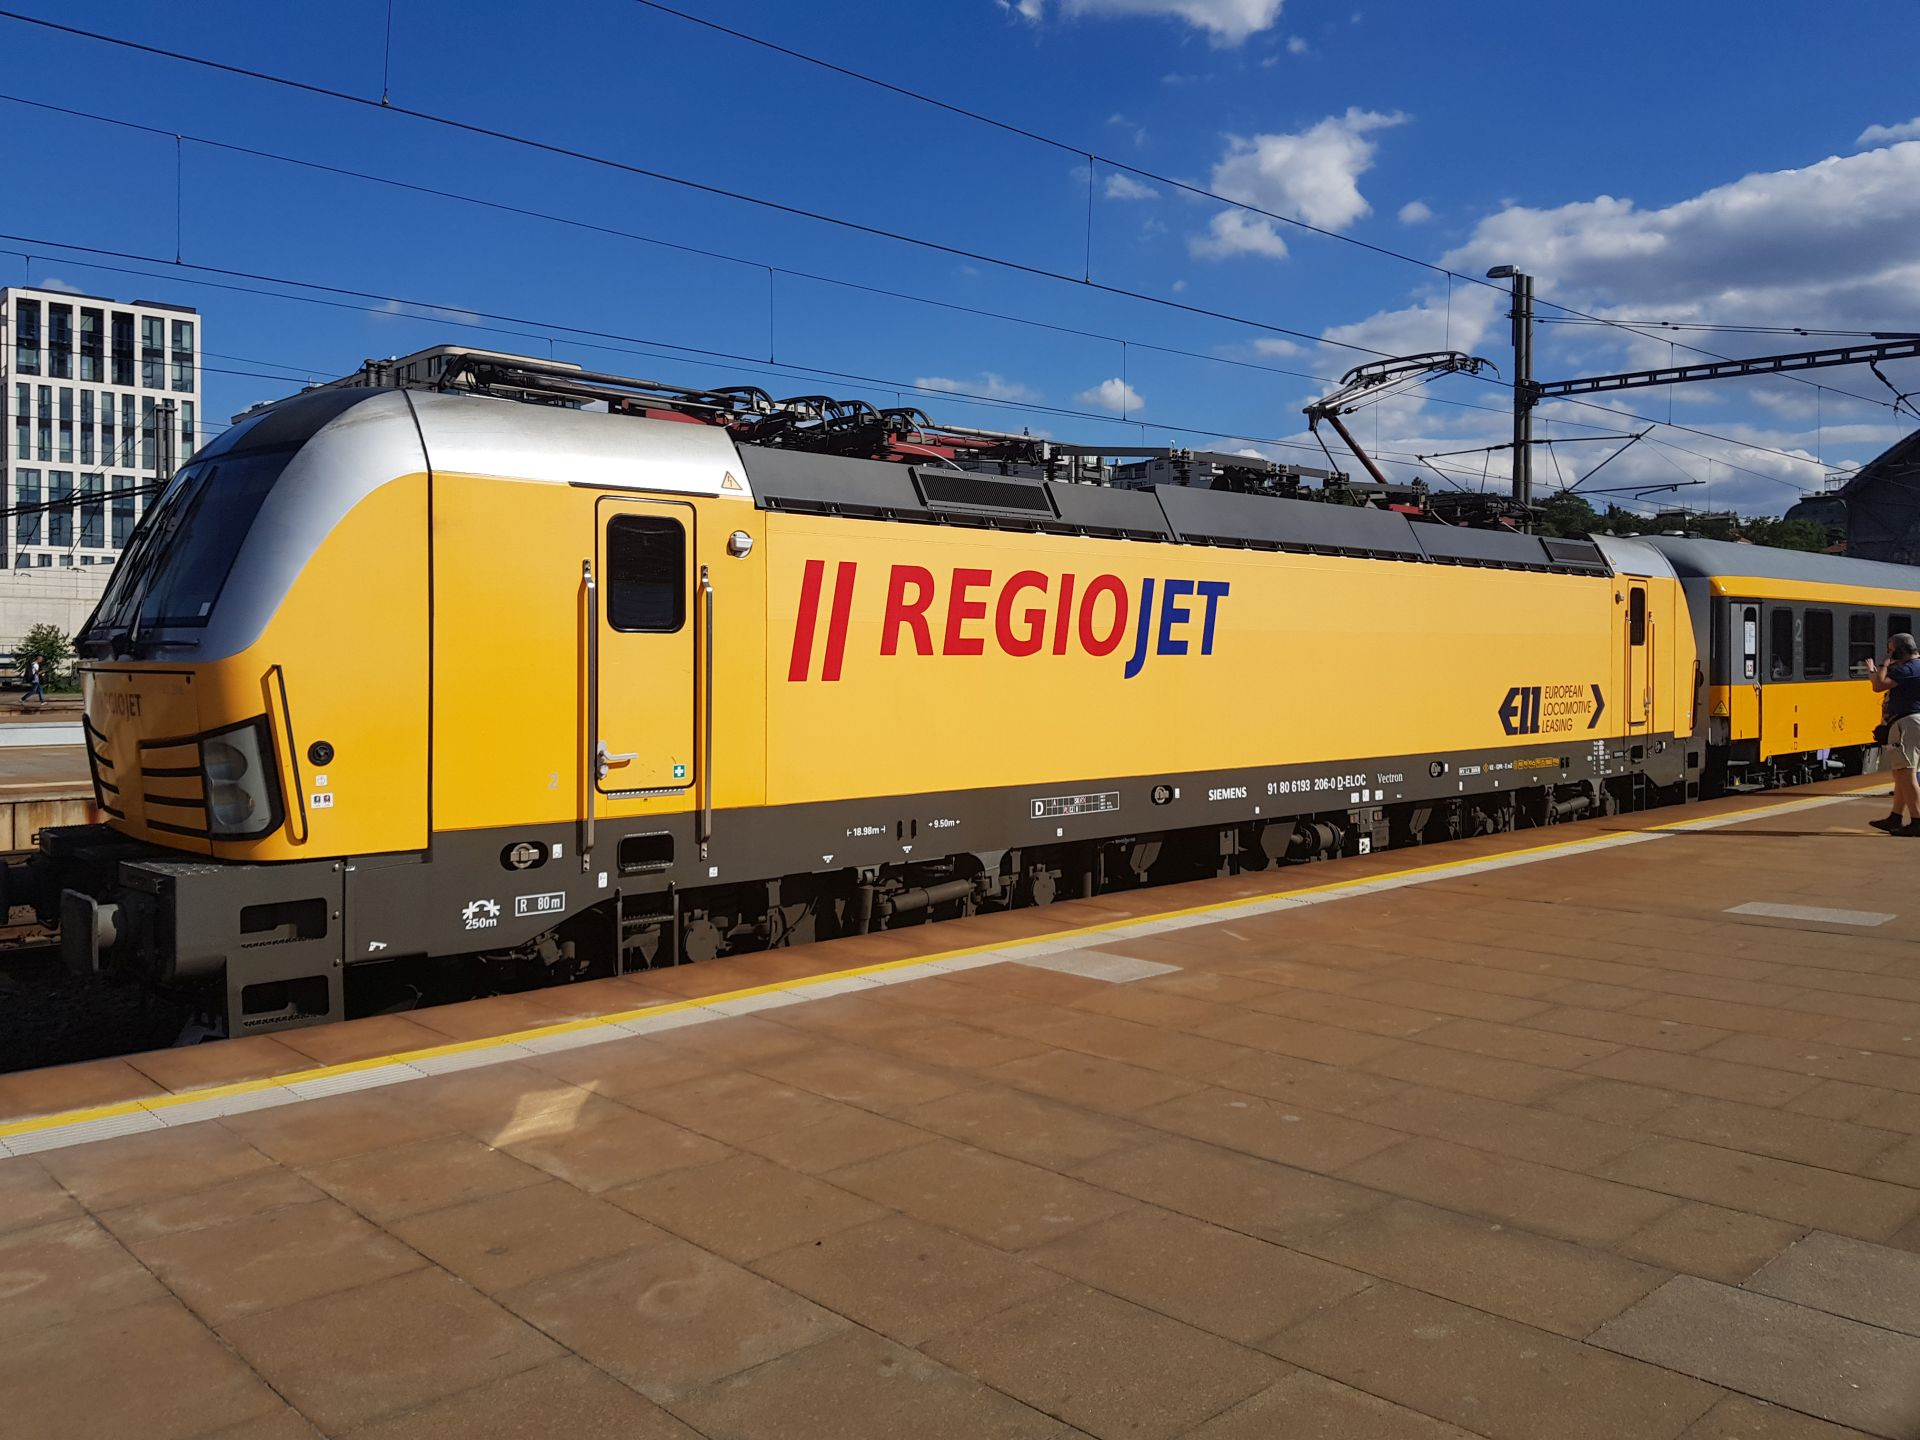 Siemens Vectron v barvách RegioJetu. Foto: Jan Sůra / Zdopravy.cz